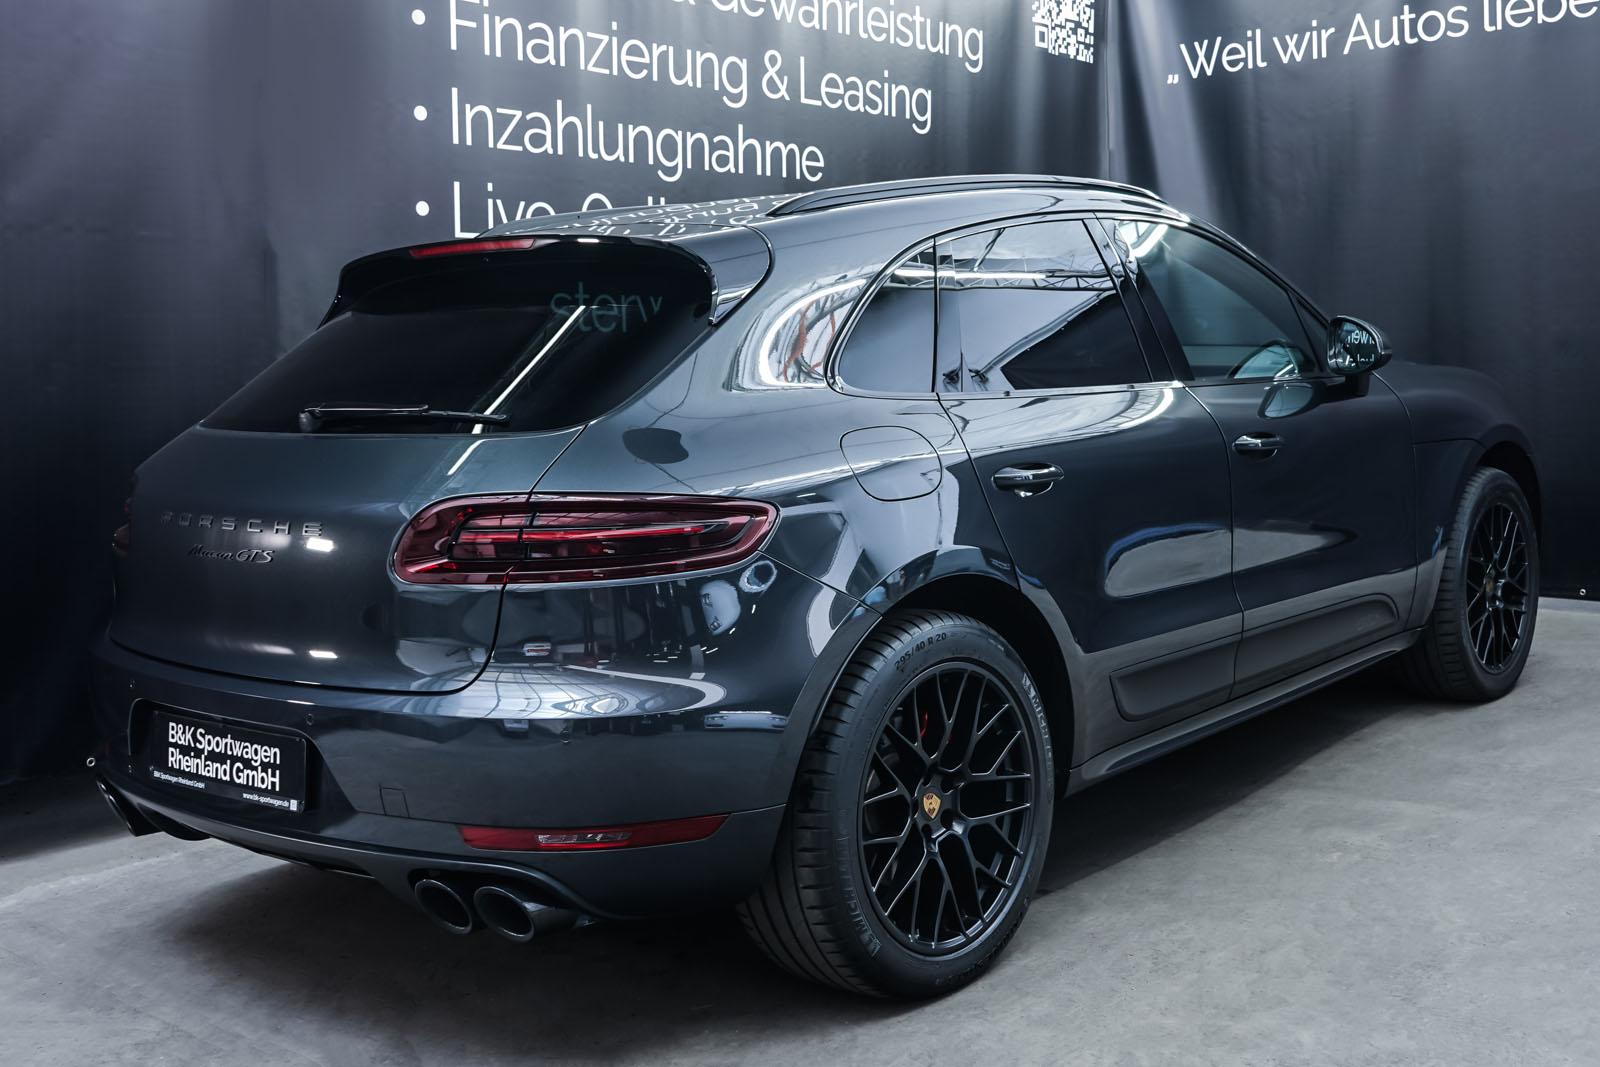 Porsche_Macan_GTS_Dunkelgrau_Schwarz_POR-8174_14_w